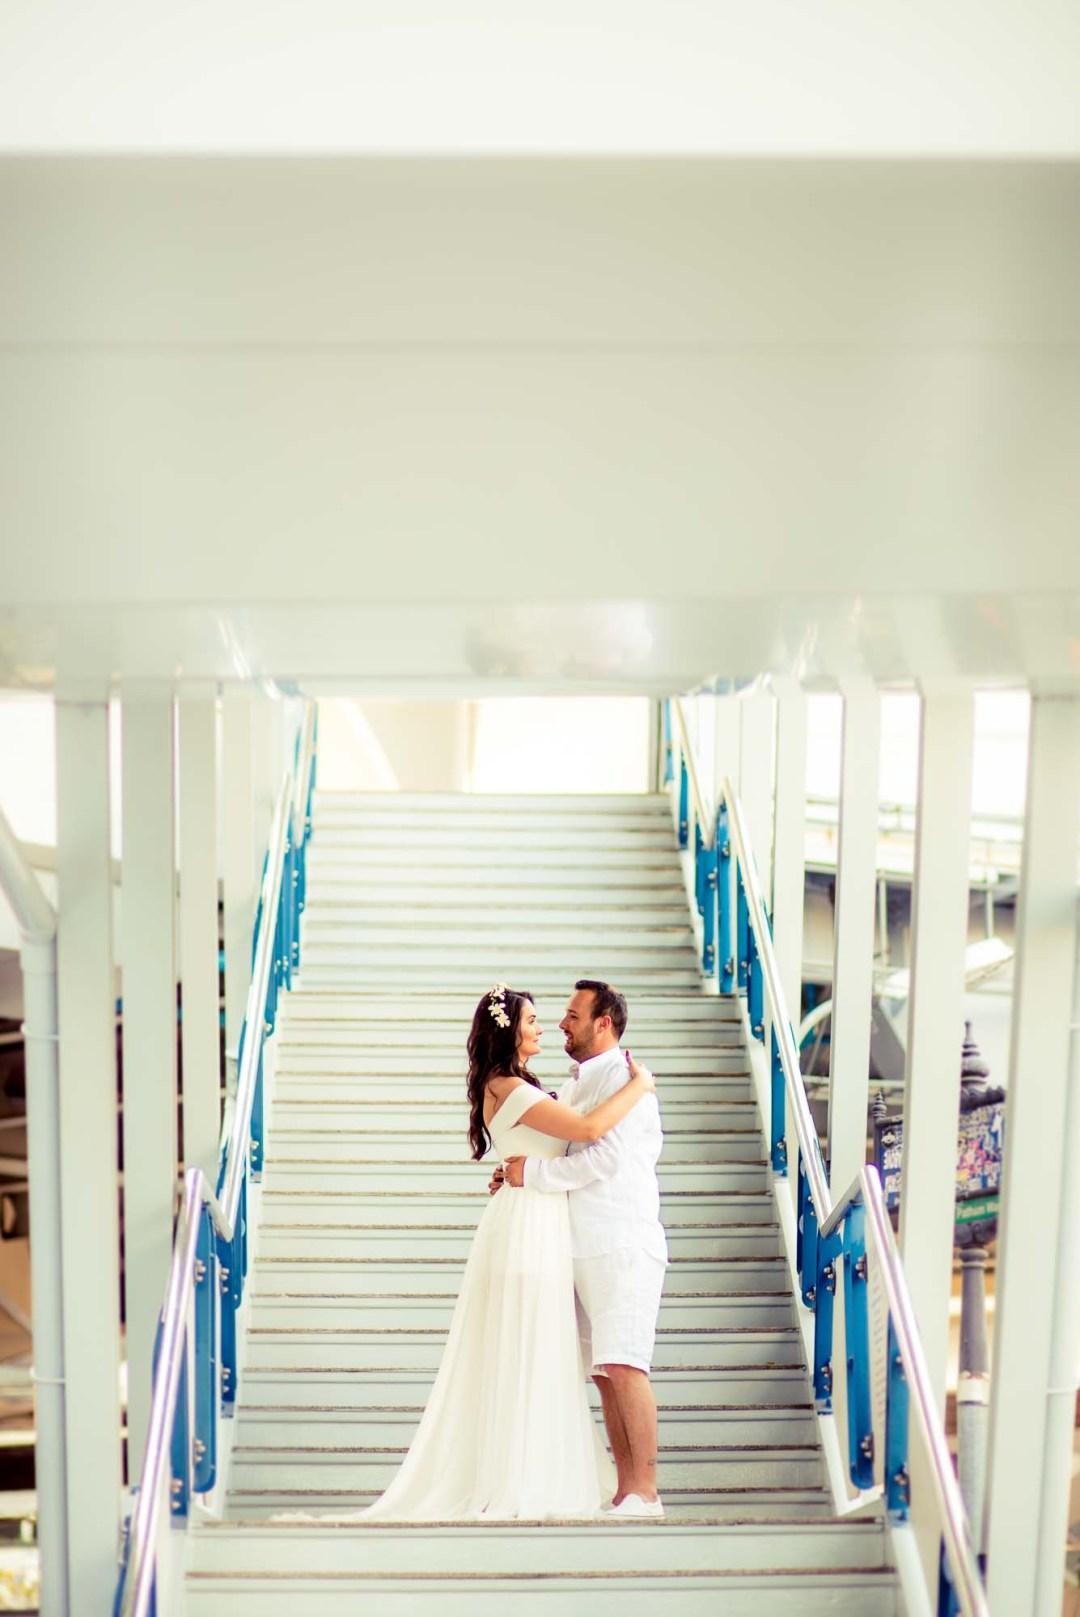 Pre-Wedding at Siam in Bangkok Thailand | Bangkok Wedding Photography